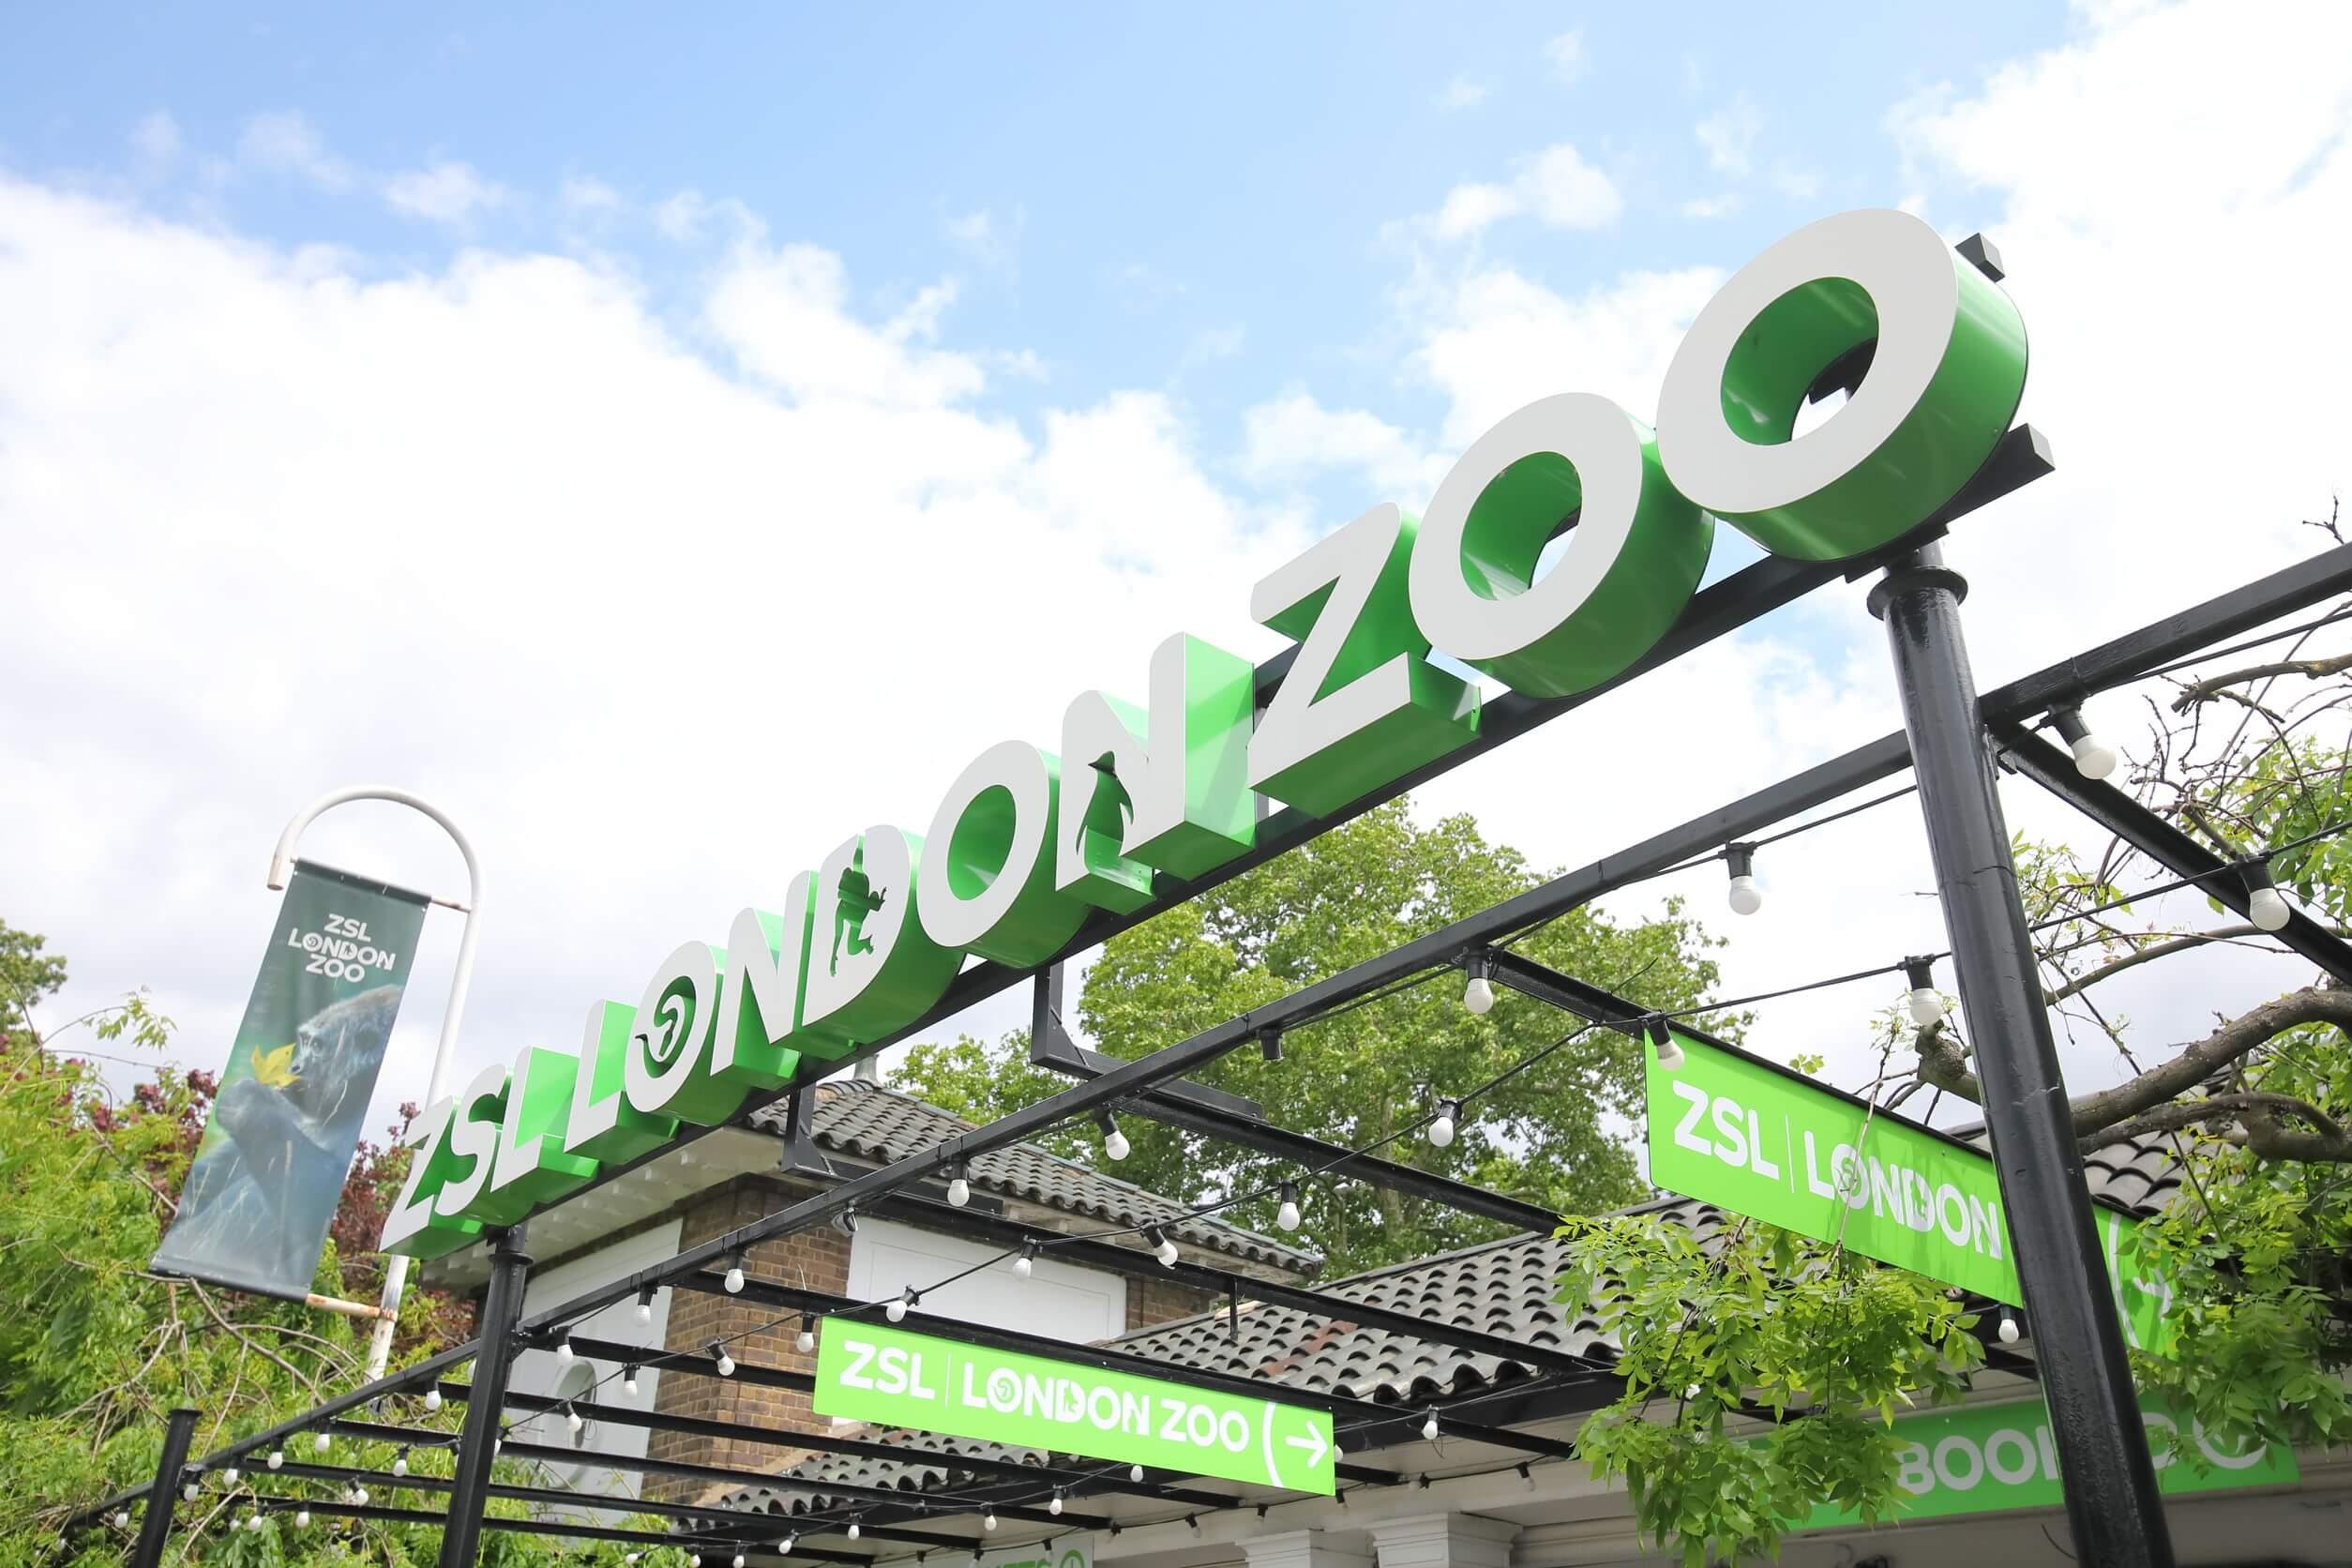 london england - june 3, 2019: zsl london zoo london uk